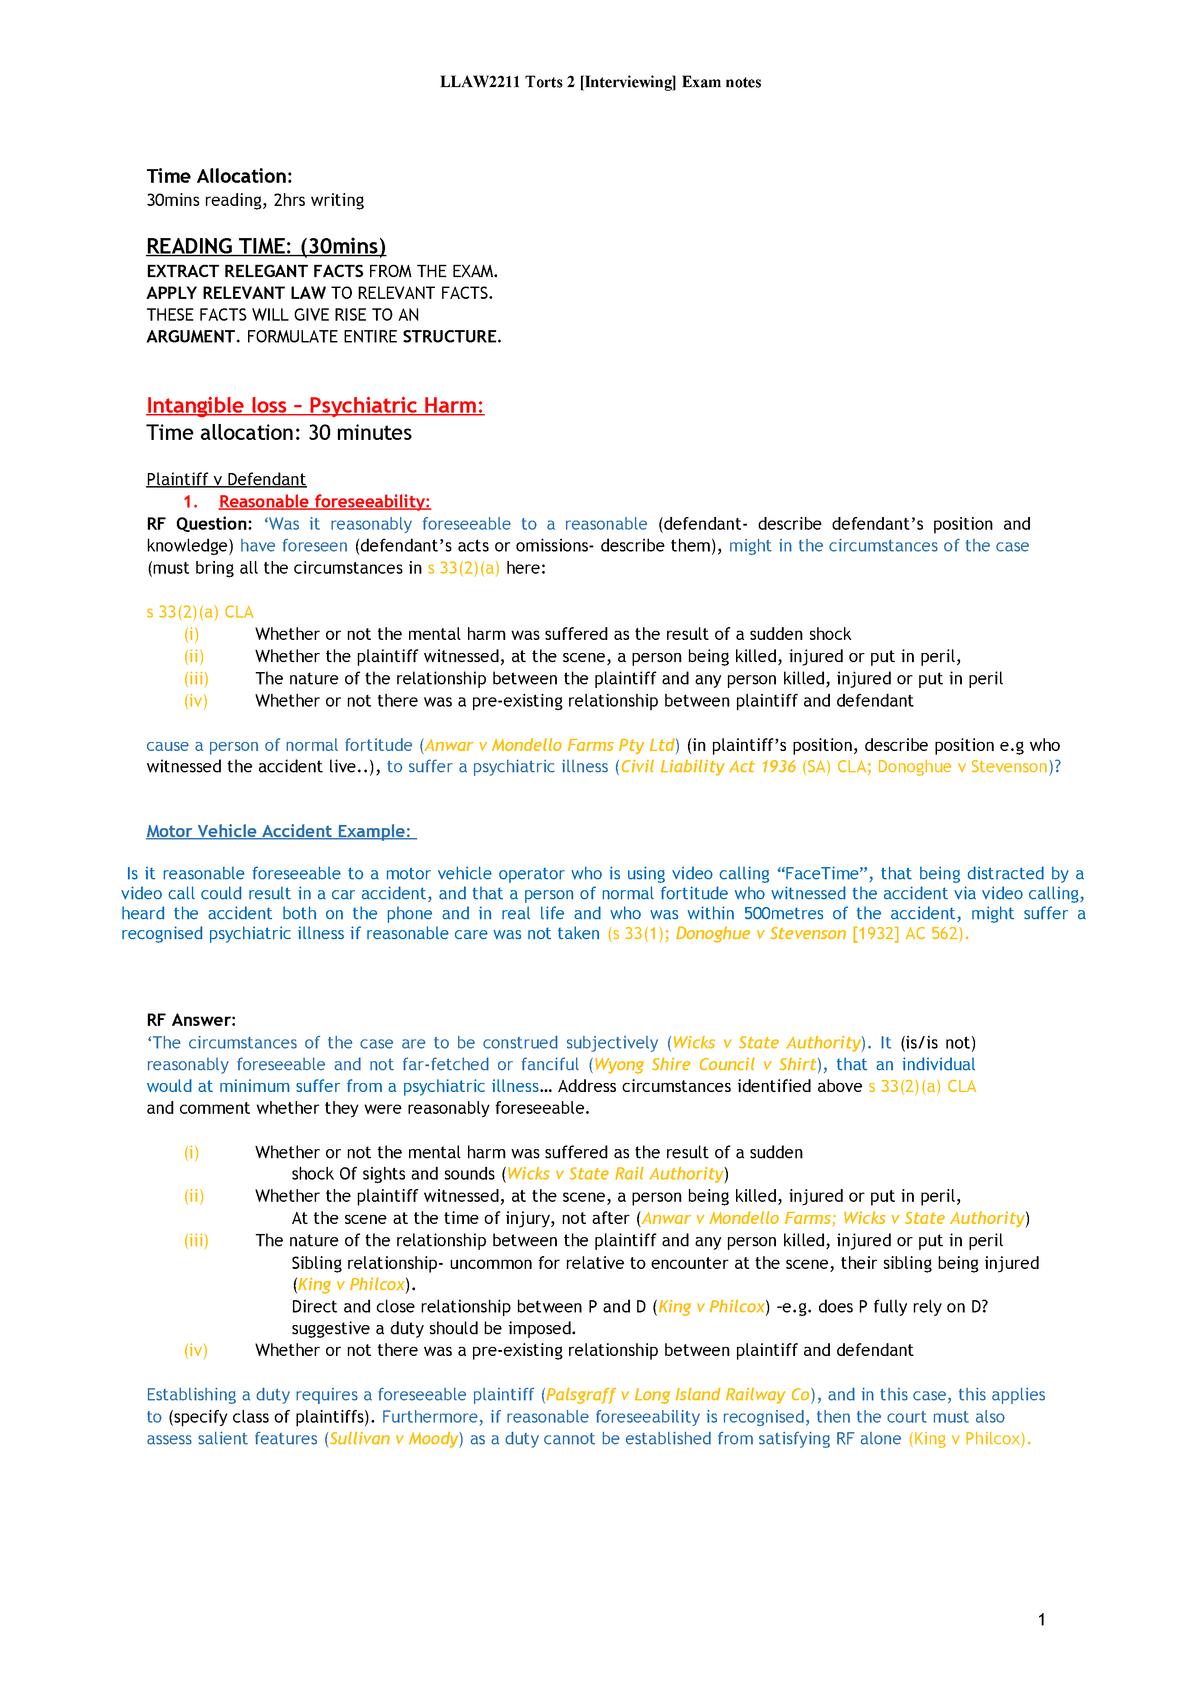 Torts 2 Exam Notes - LLAW2211 - StuDocu